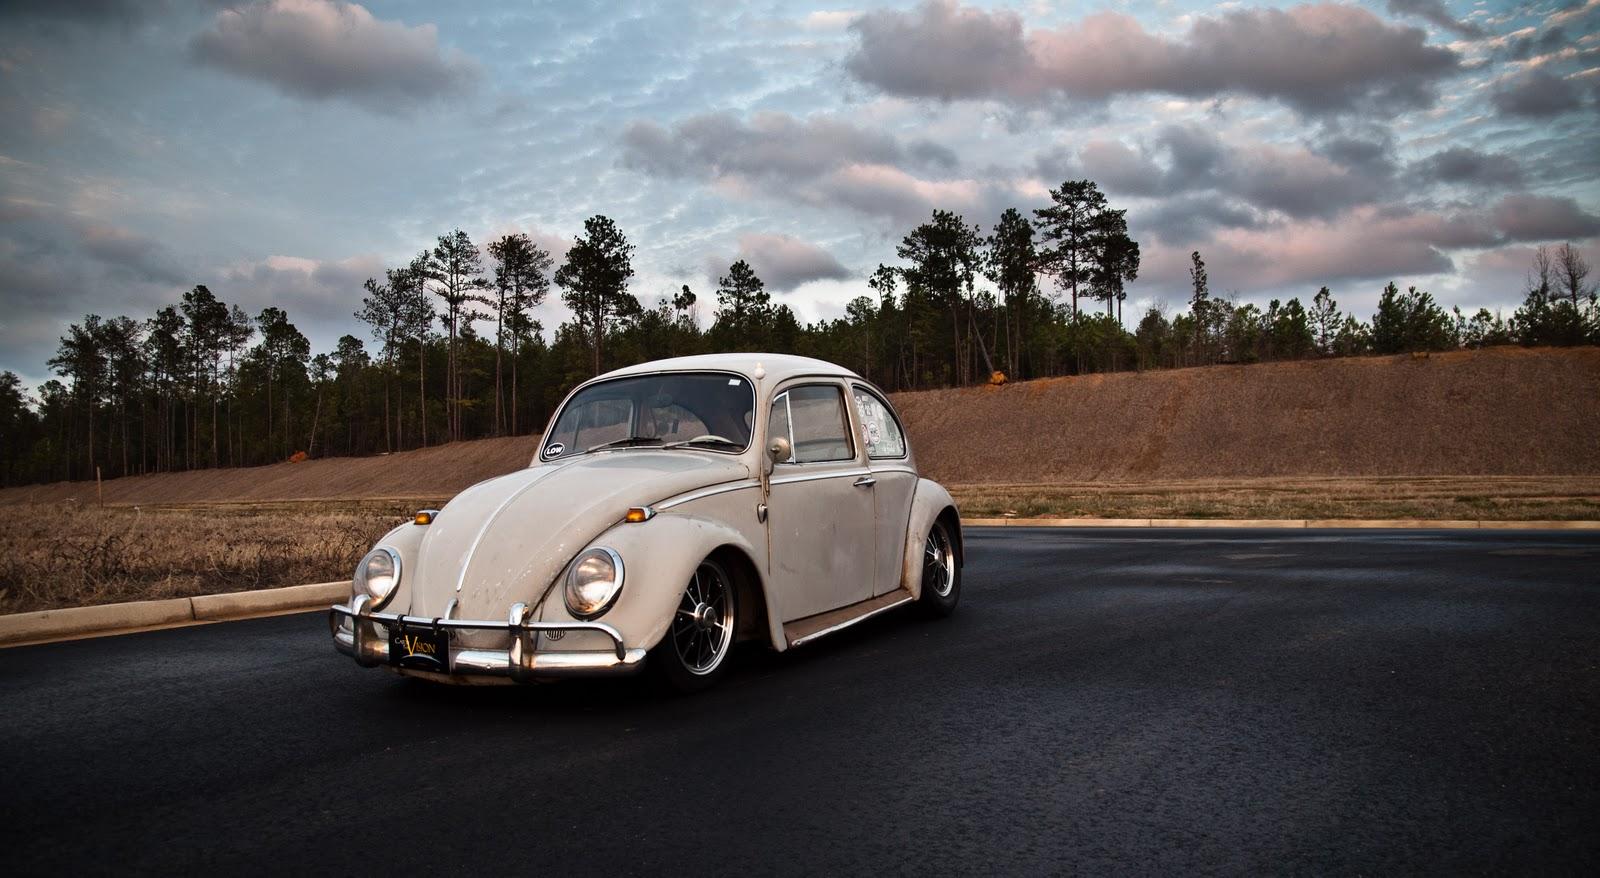 Otis - my '65 Beetle DSC_0025